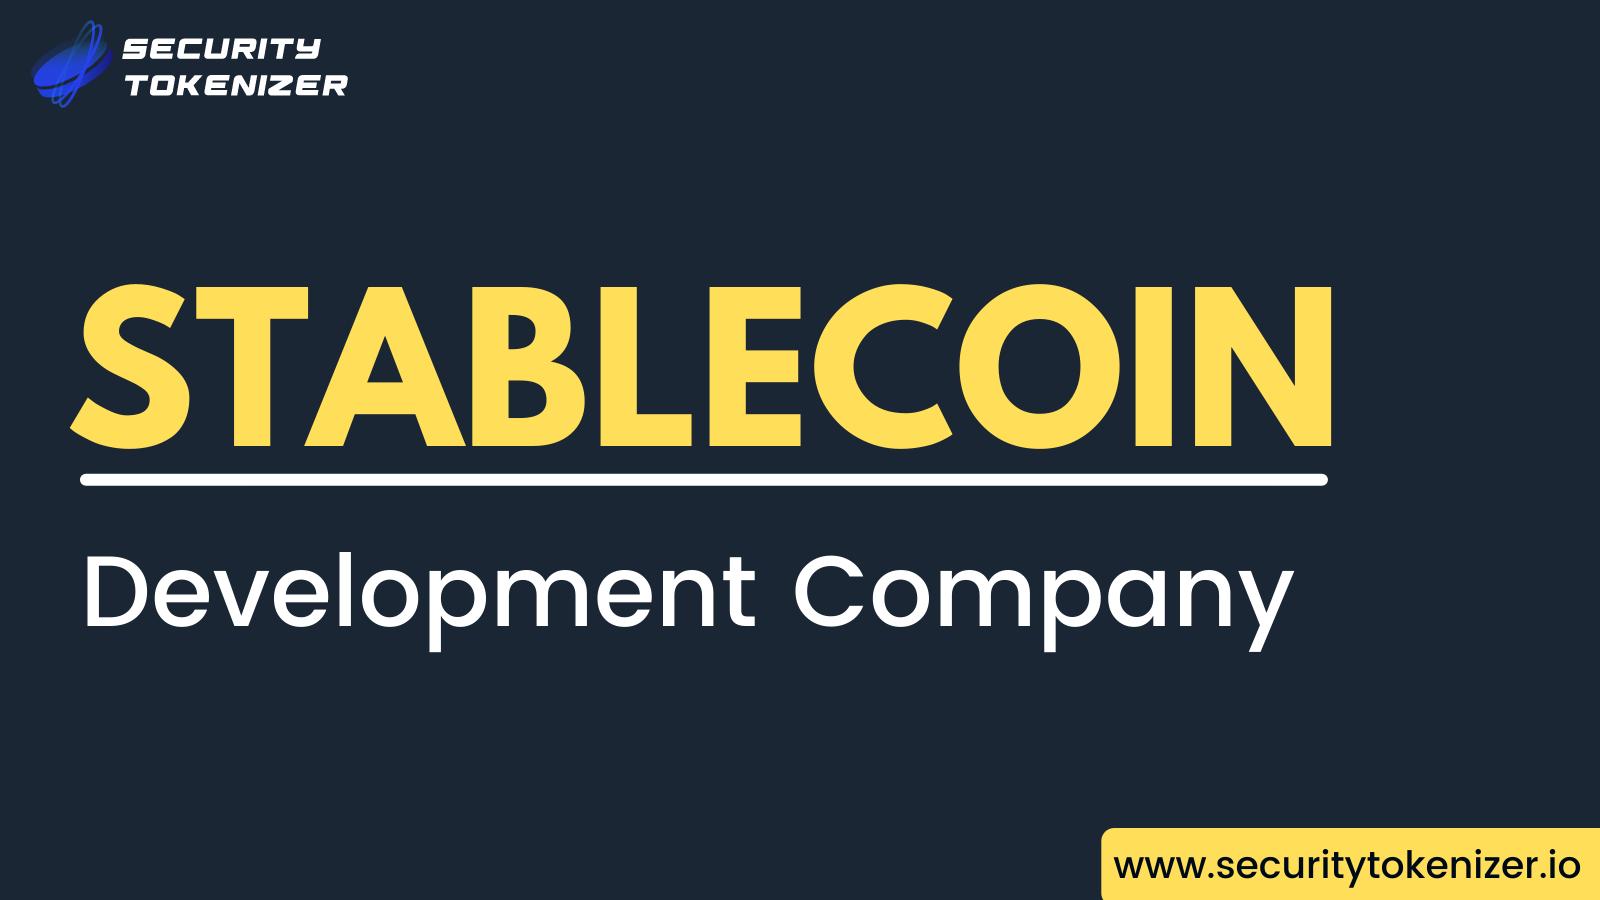 Stablecoin Development Company - Security Tokenizer